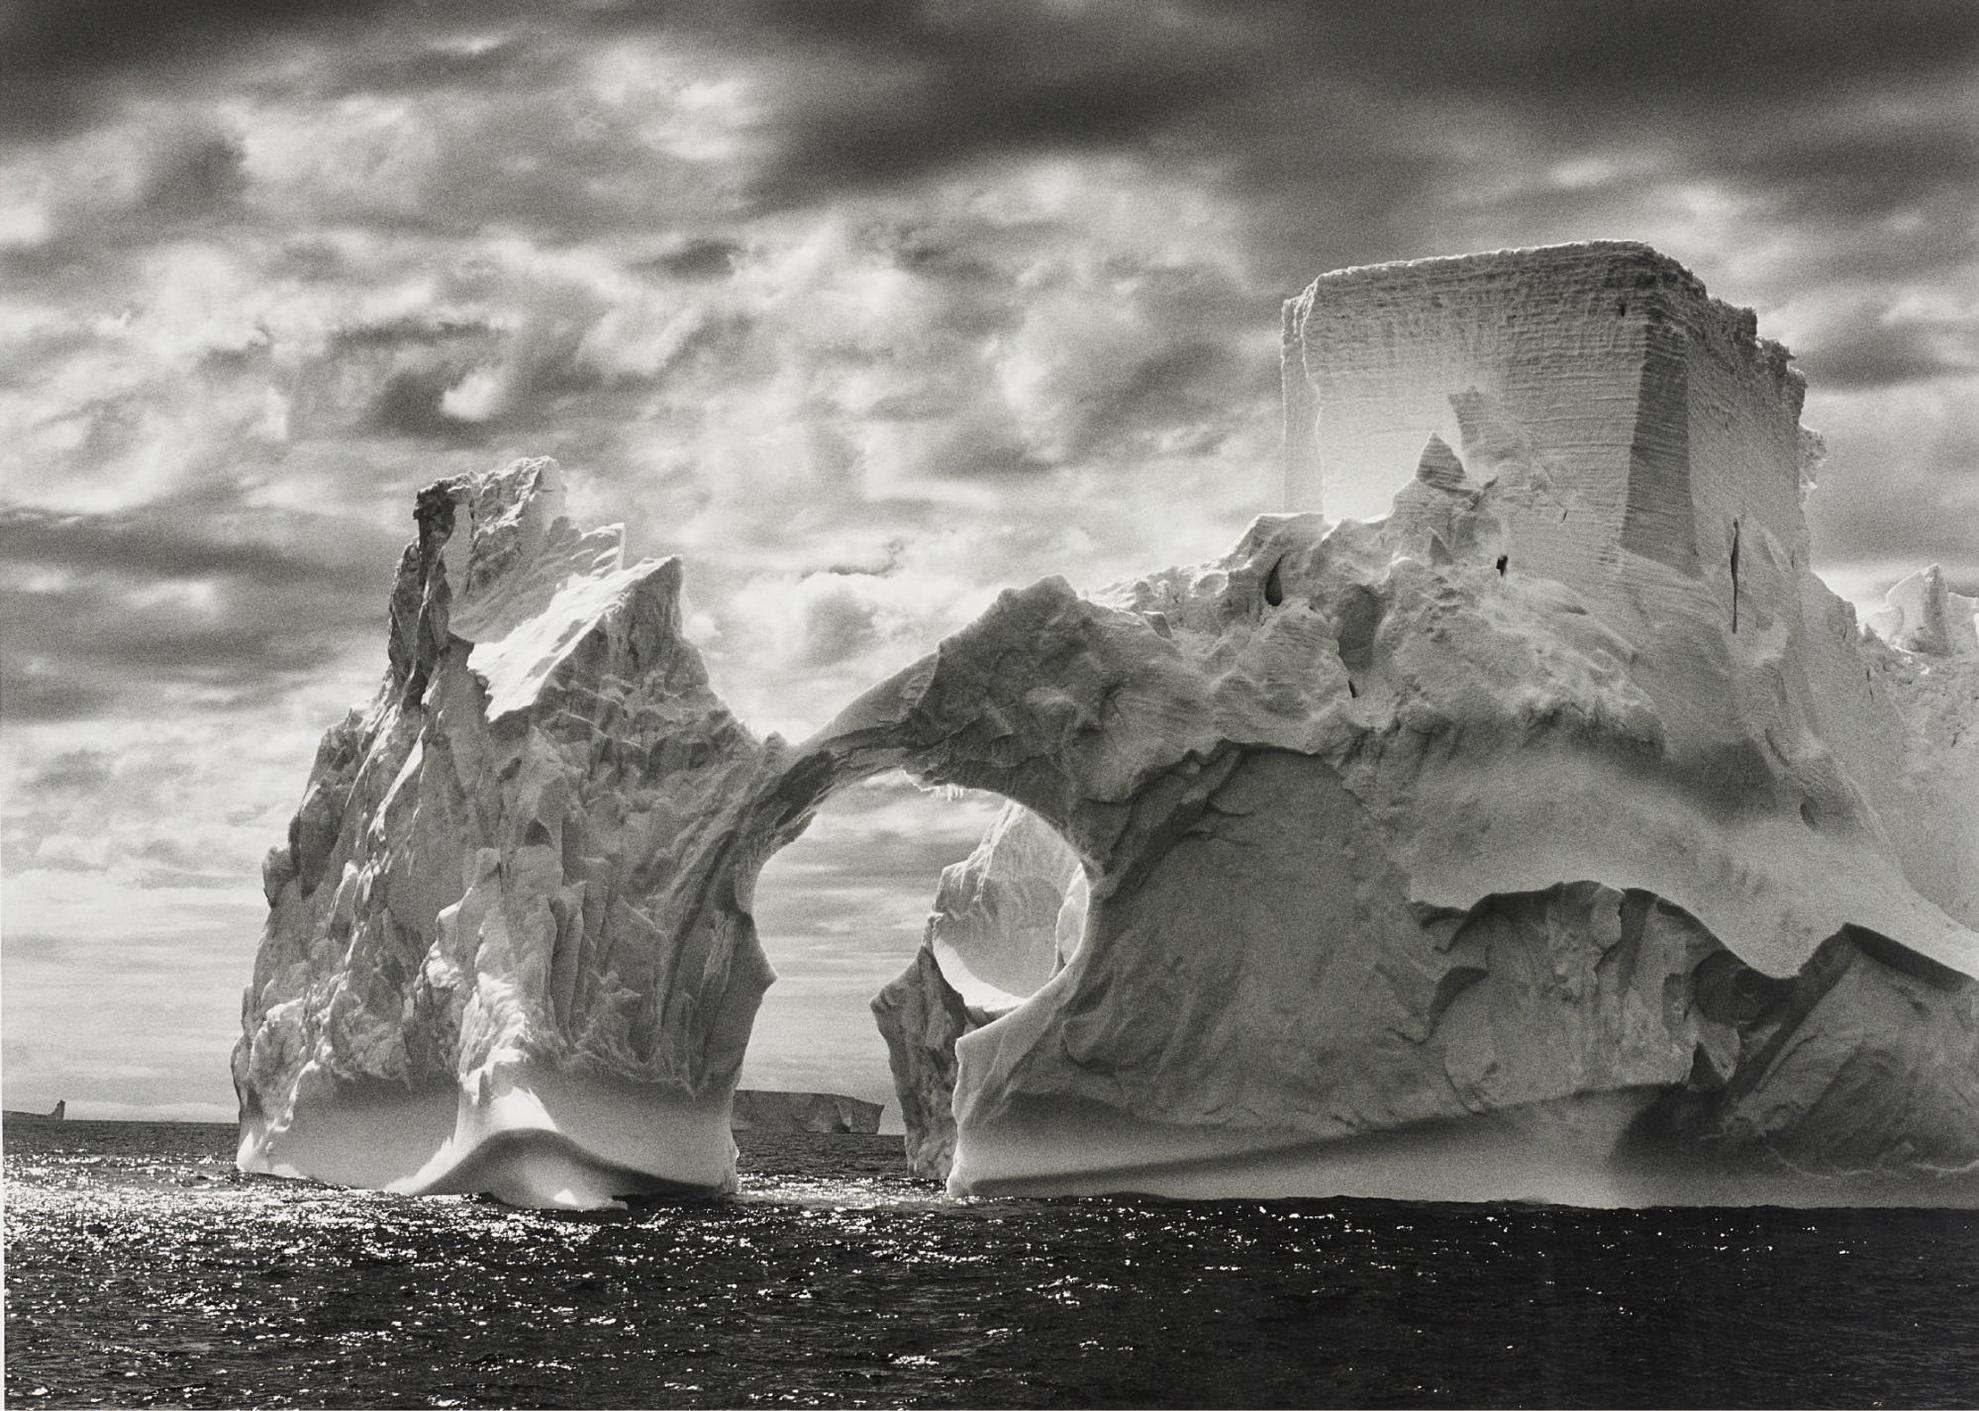 Sebastiao Salgado-Iceberg Between The Paulet Island And The South Shetland Islands, Antarctica-2005